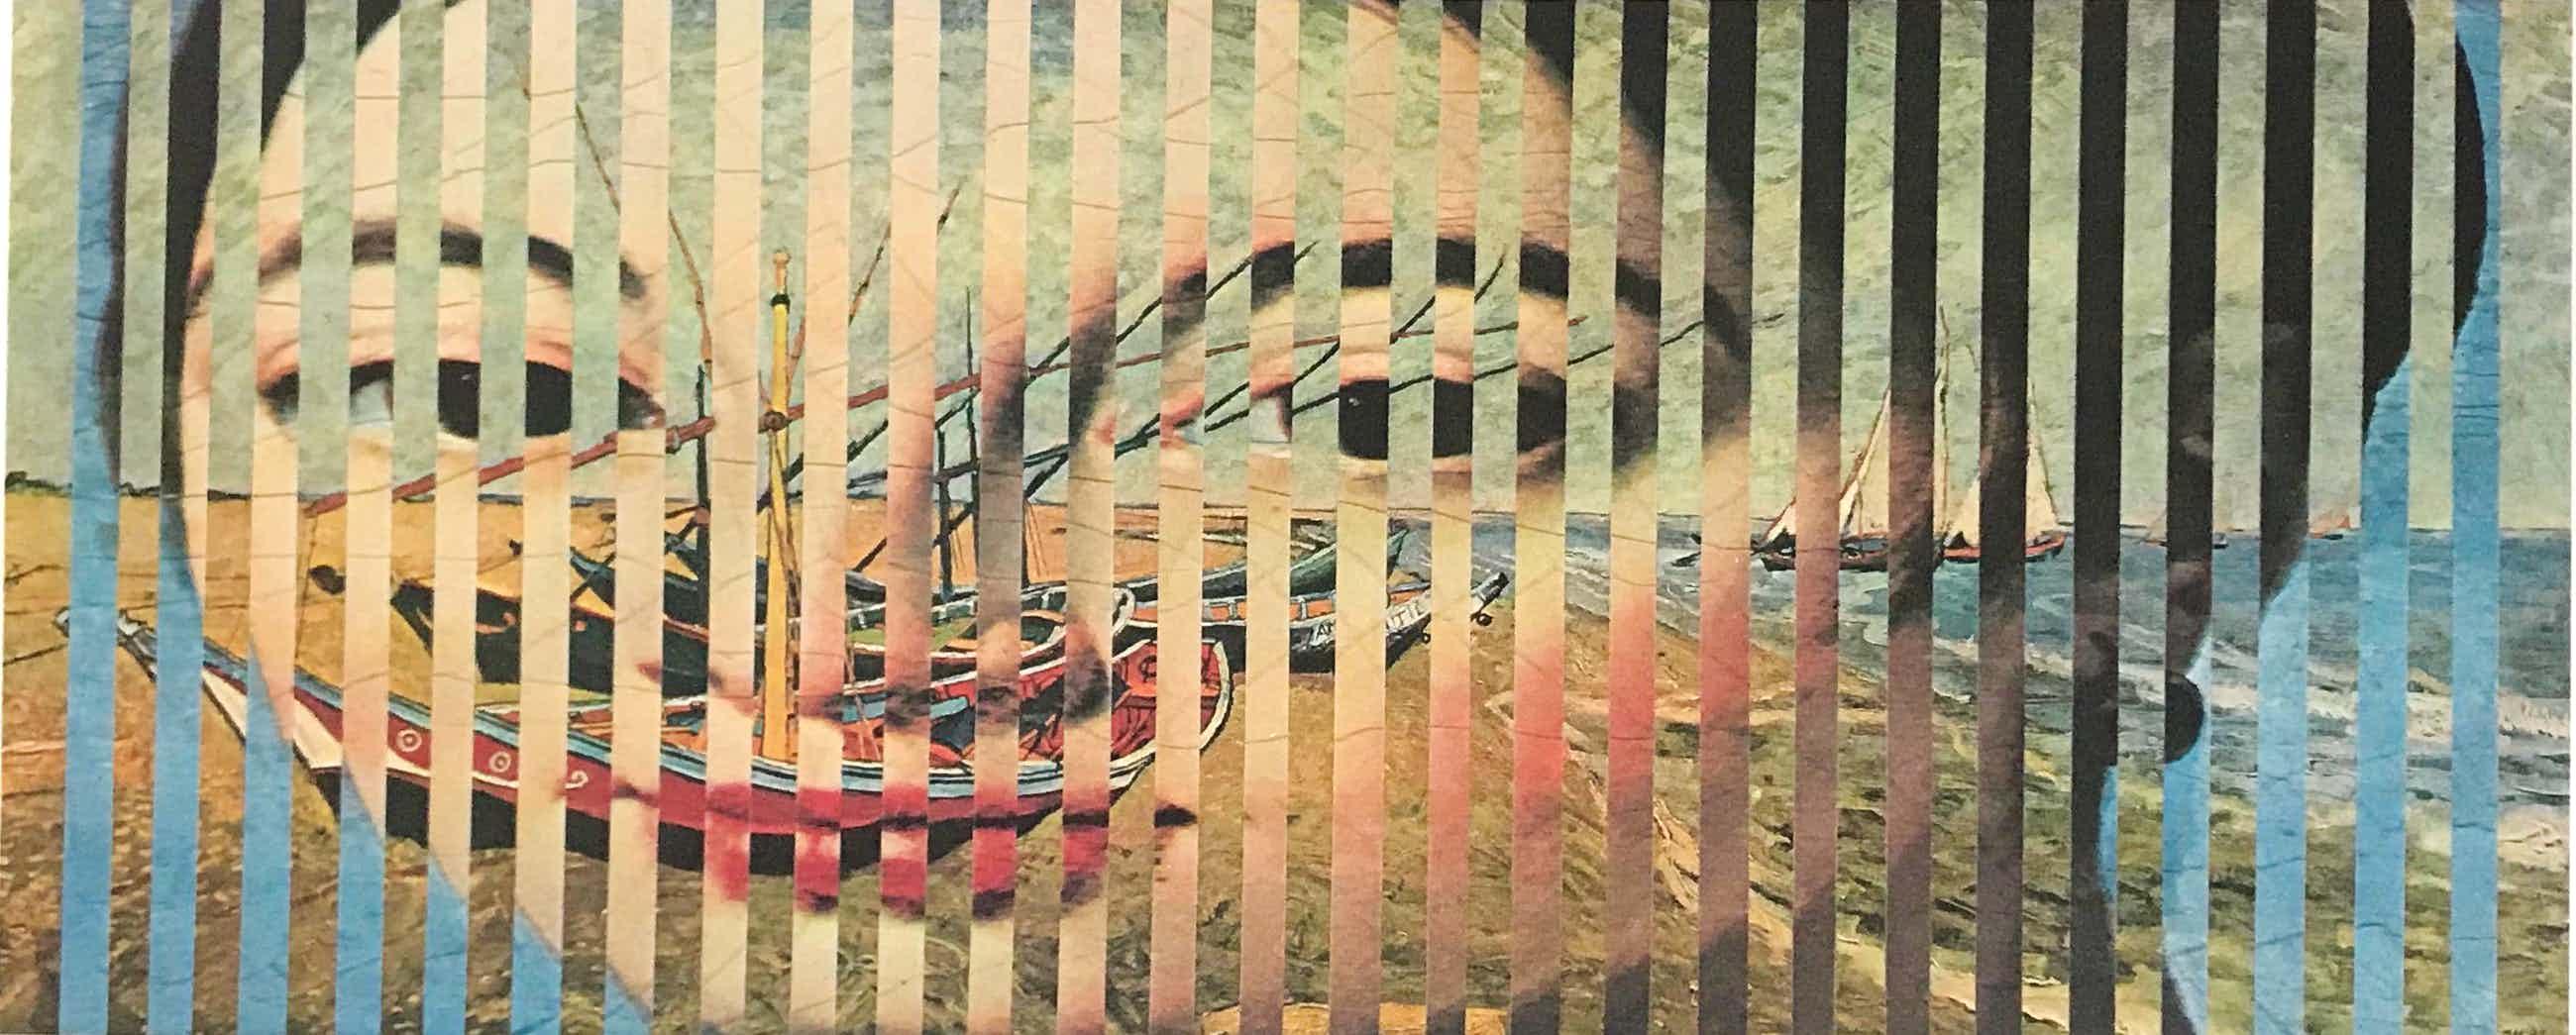 Jiri Kolar - Mooie zeefdruk - 1981 - Gesigneerd - 250/250 kopen? Bied vanaf 125!